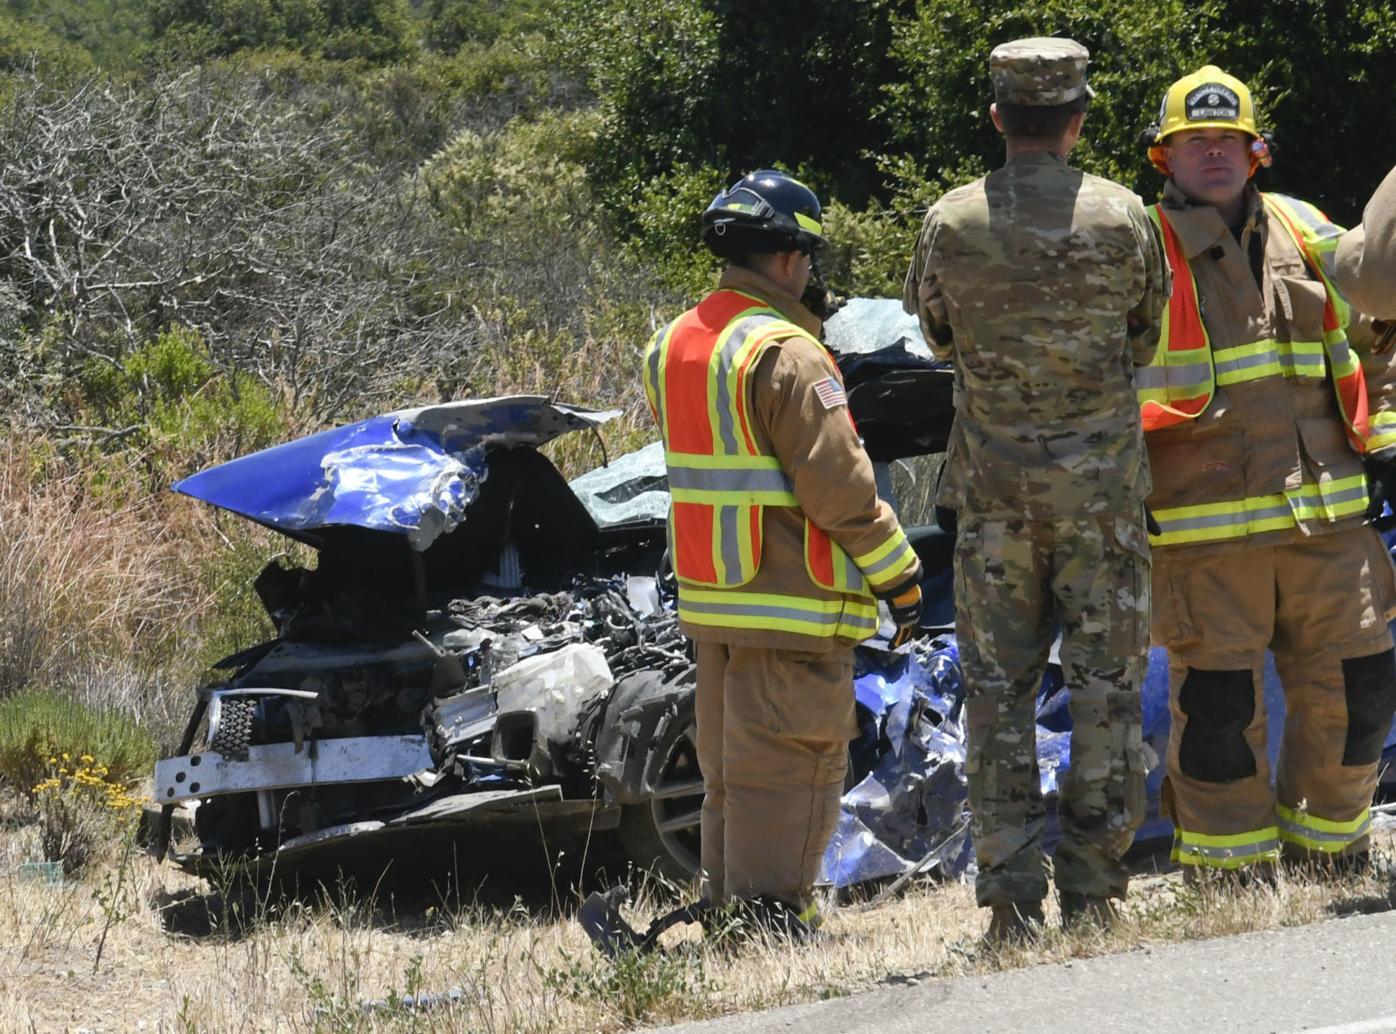 061620 VAFB fatal crash 03.jpg